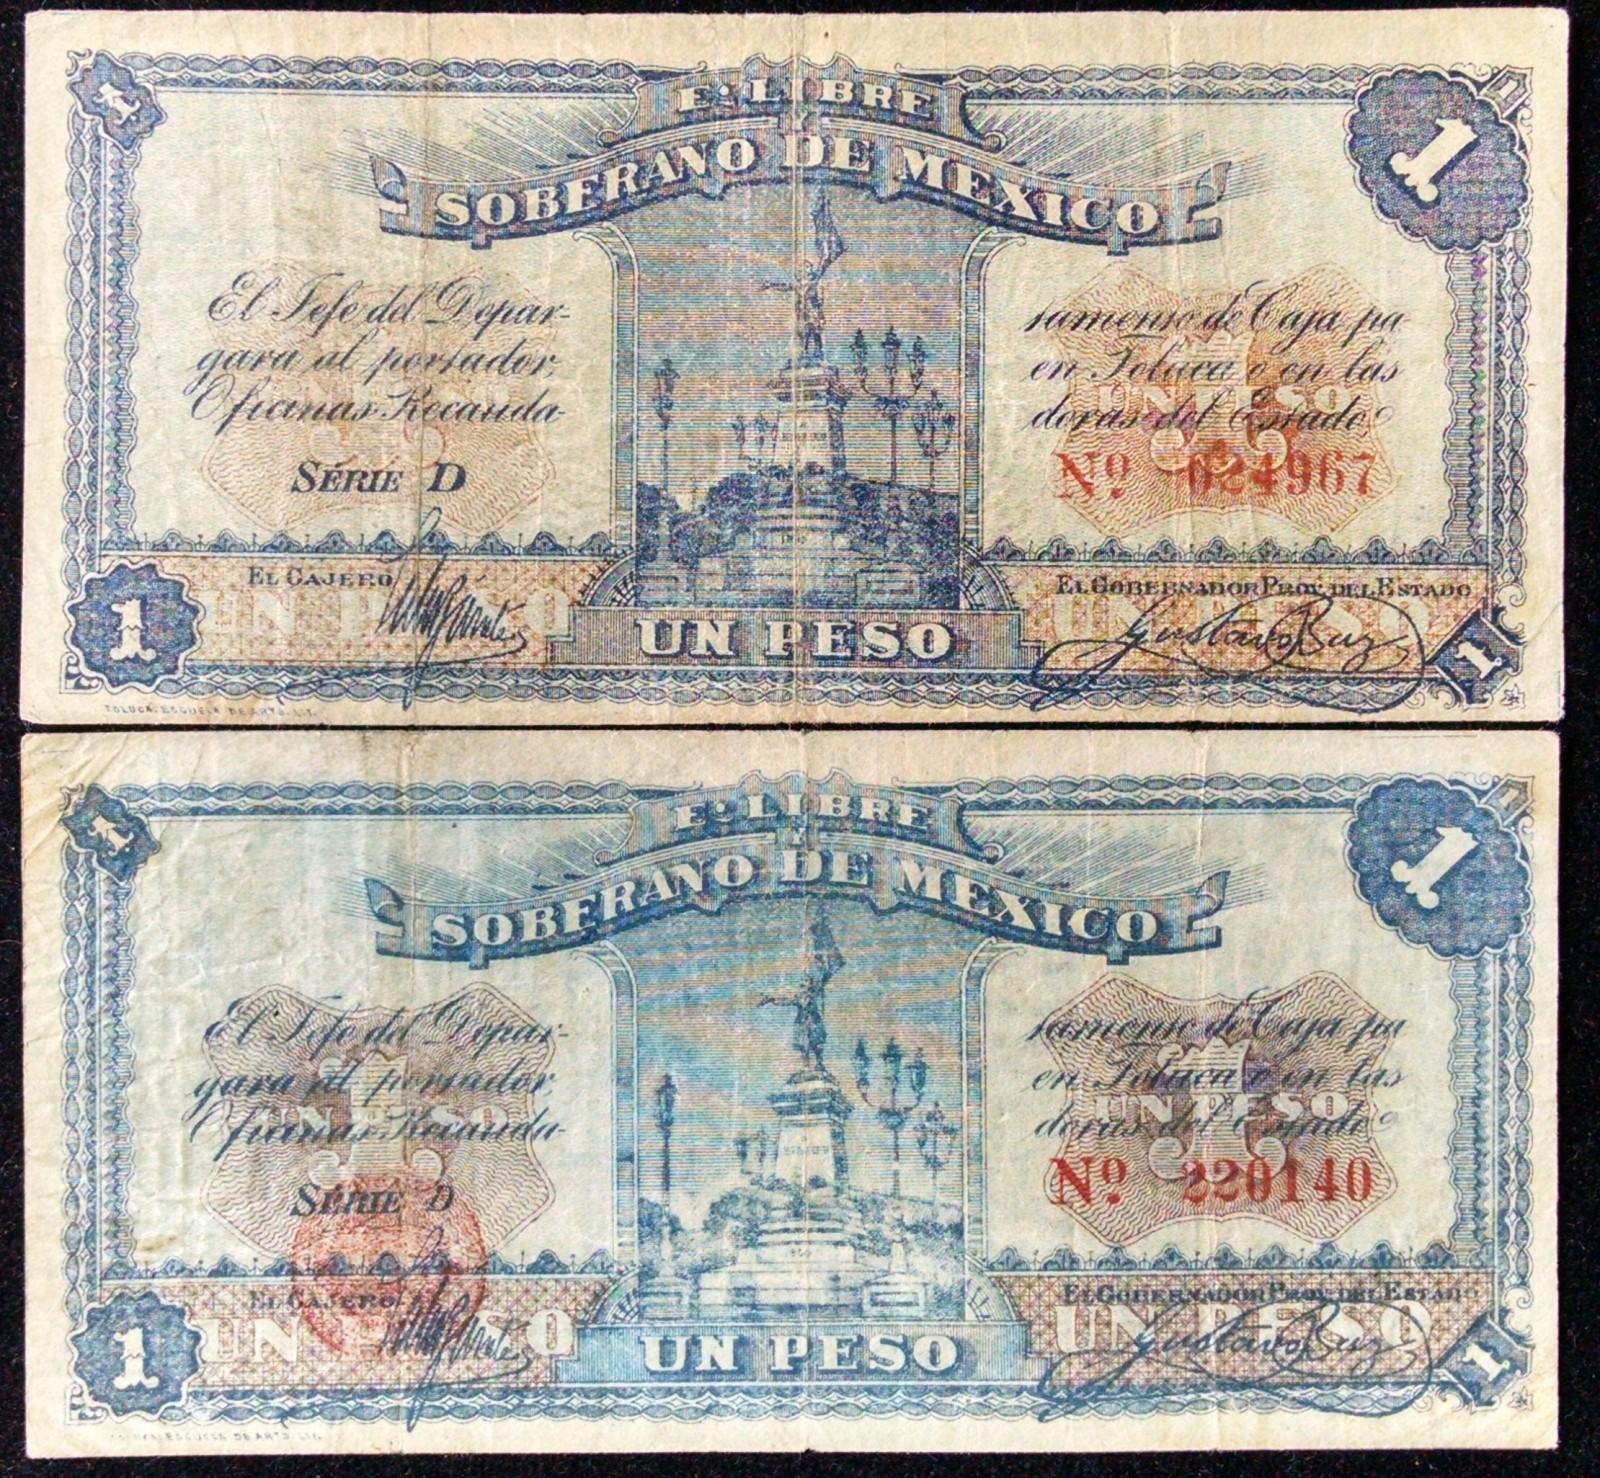 1 peso 1915 Mexico 33ww3np